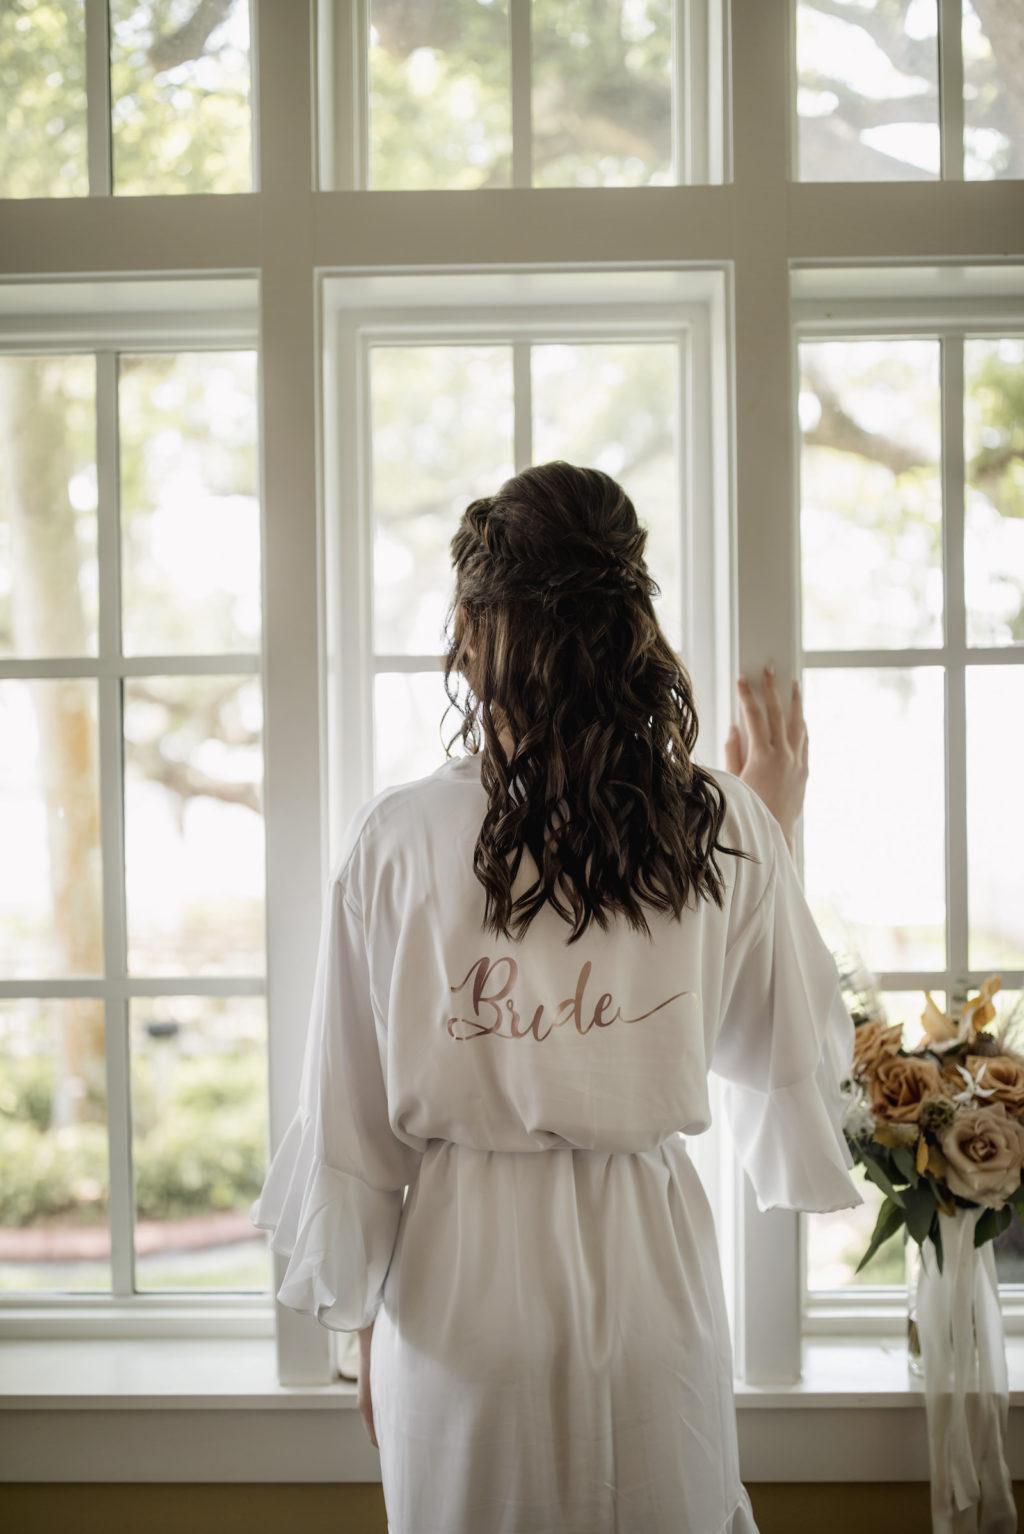 White Satin Short Bride Robe   Bride Getting Ready on Wedding Day